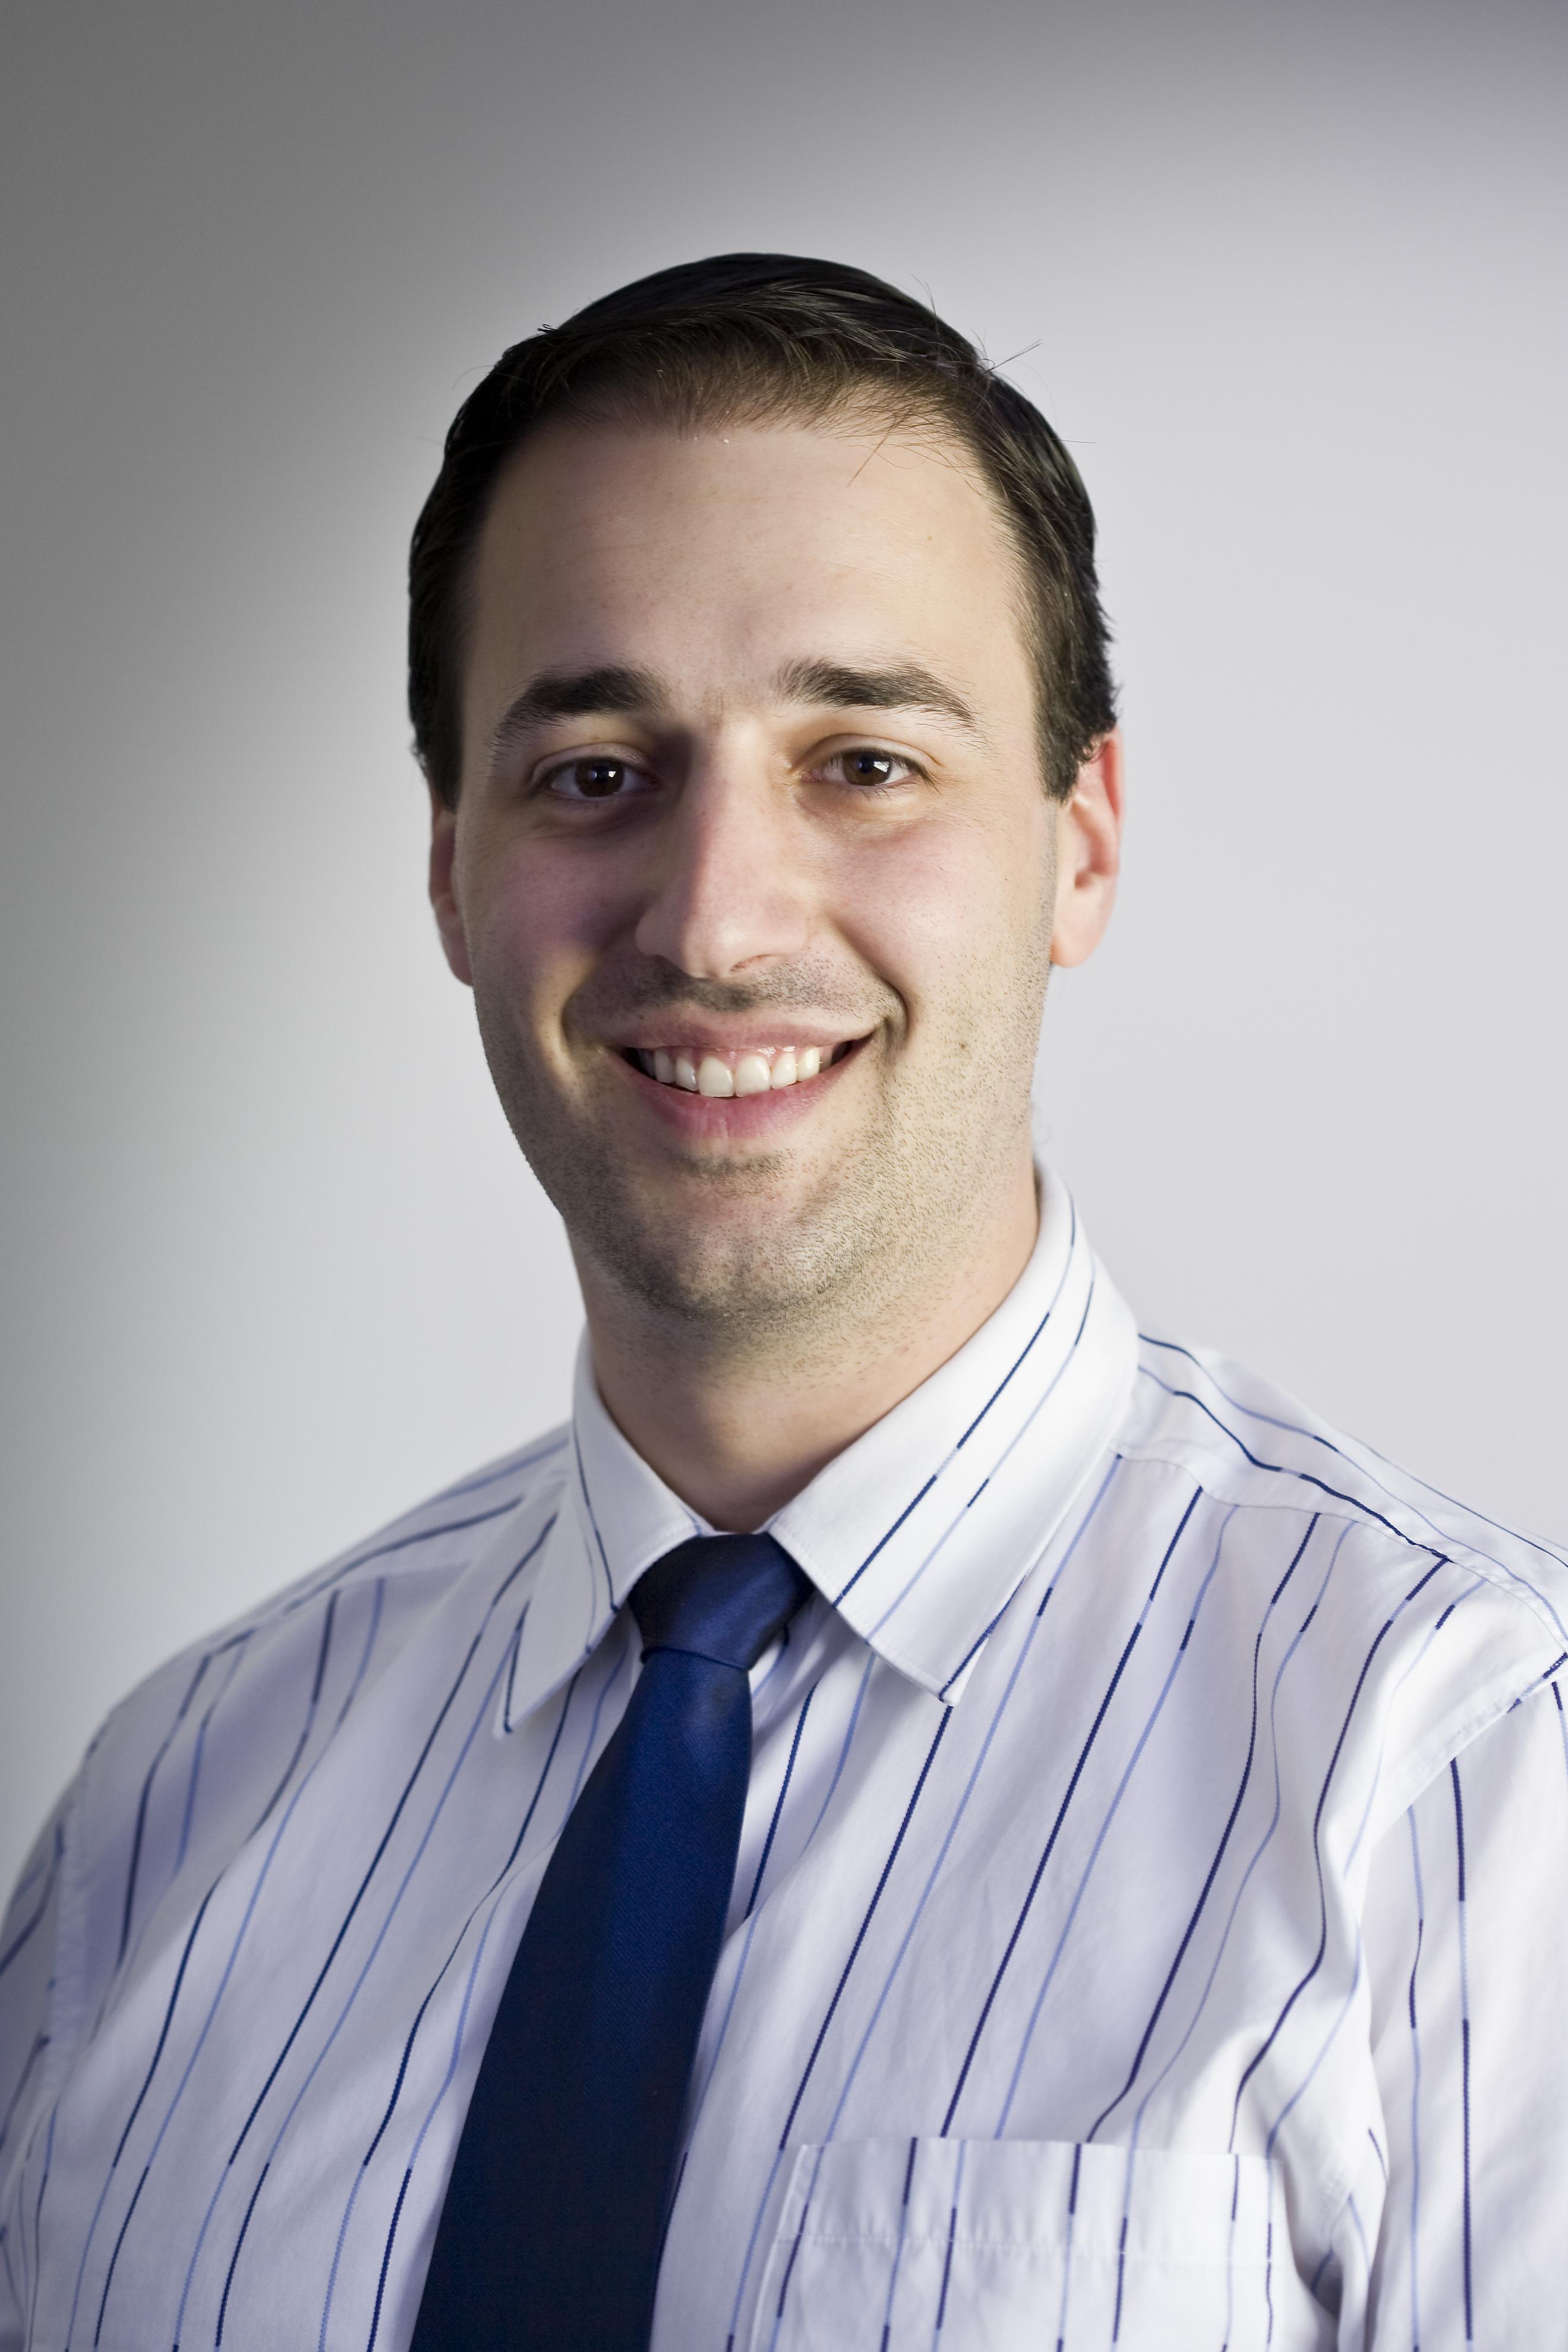 Dr Arthur Masis